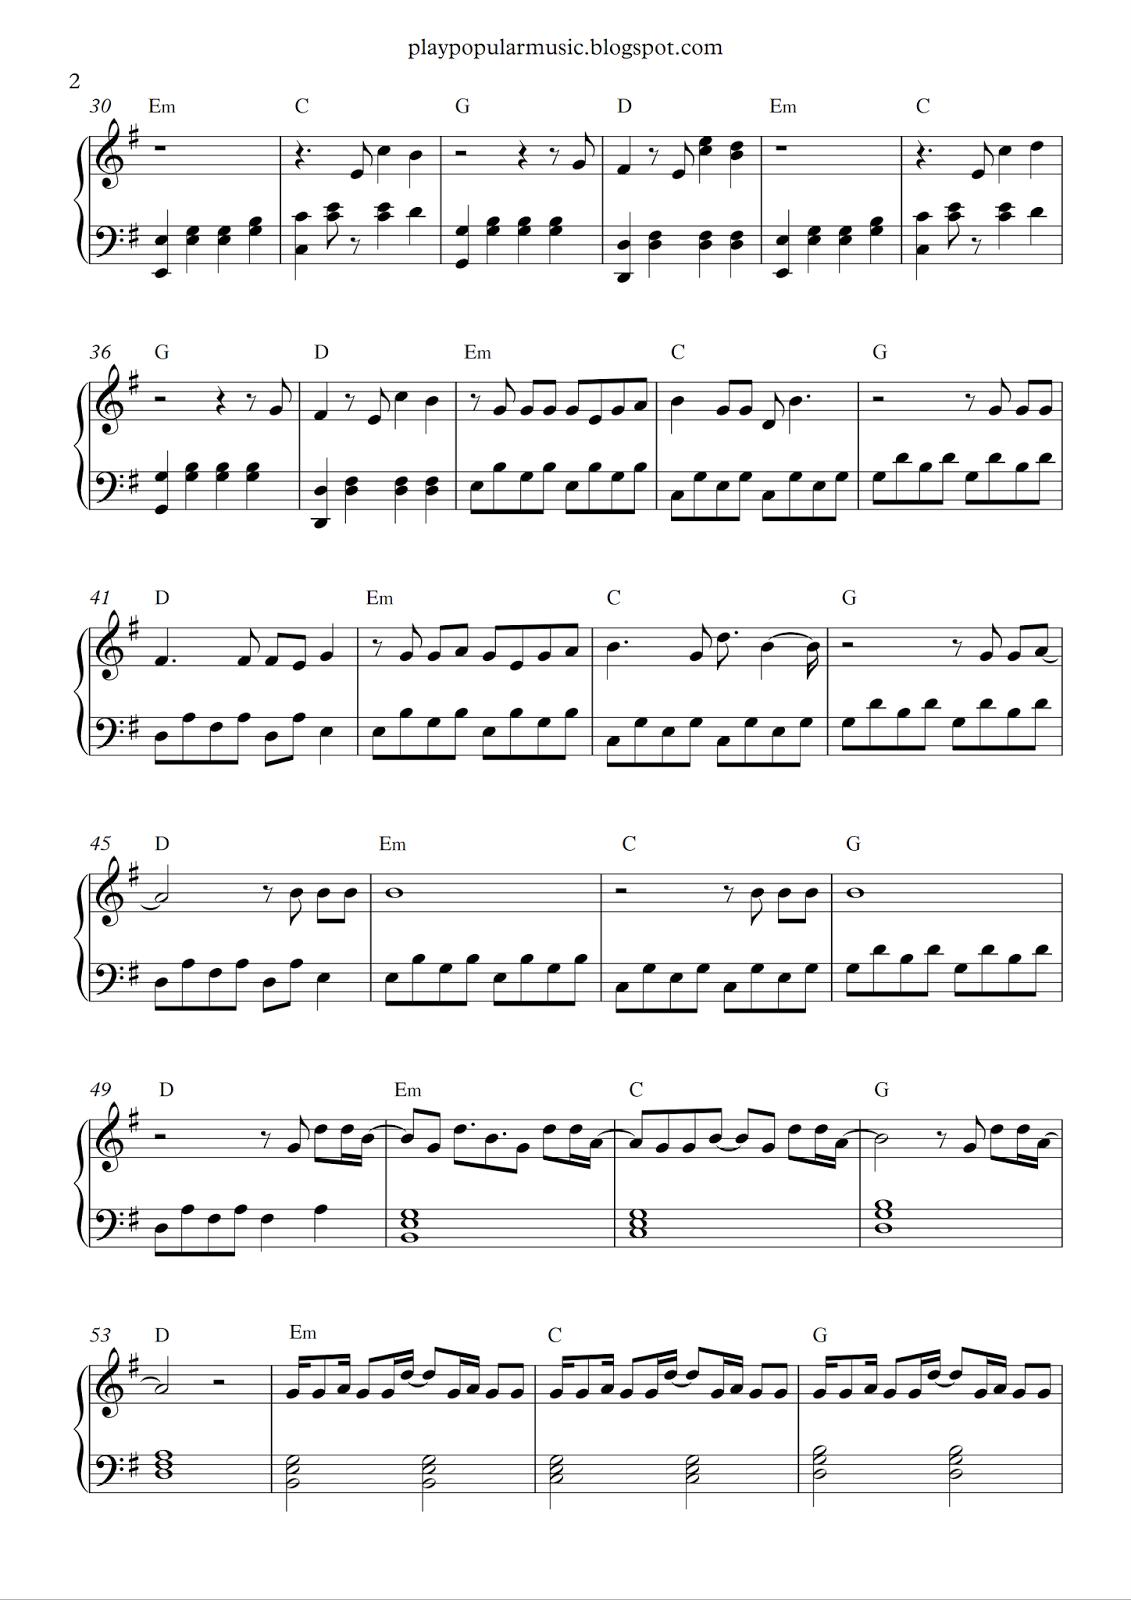 Free Piano Sheet Music Alan Walker Faded Pdf You Were The Shadow To My Li Ght Did You Feel Us Alan Walker Piano Sheet Music Free Piano Sheet Music